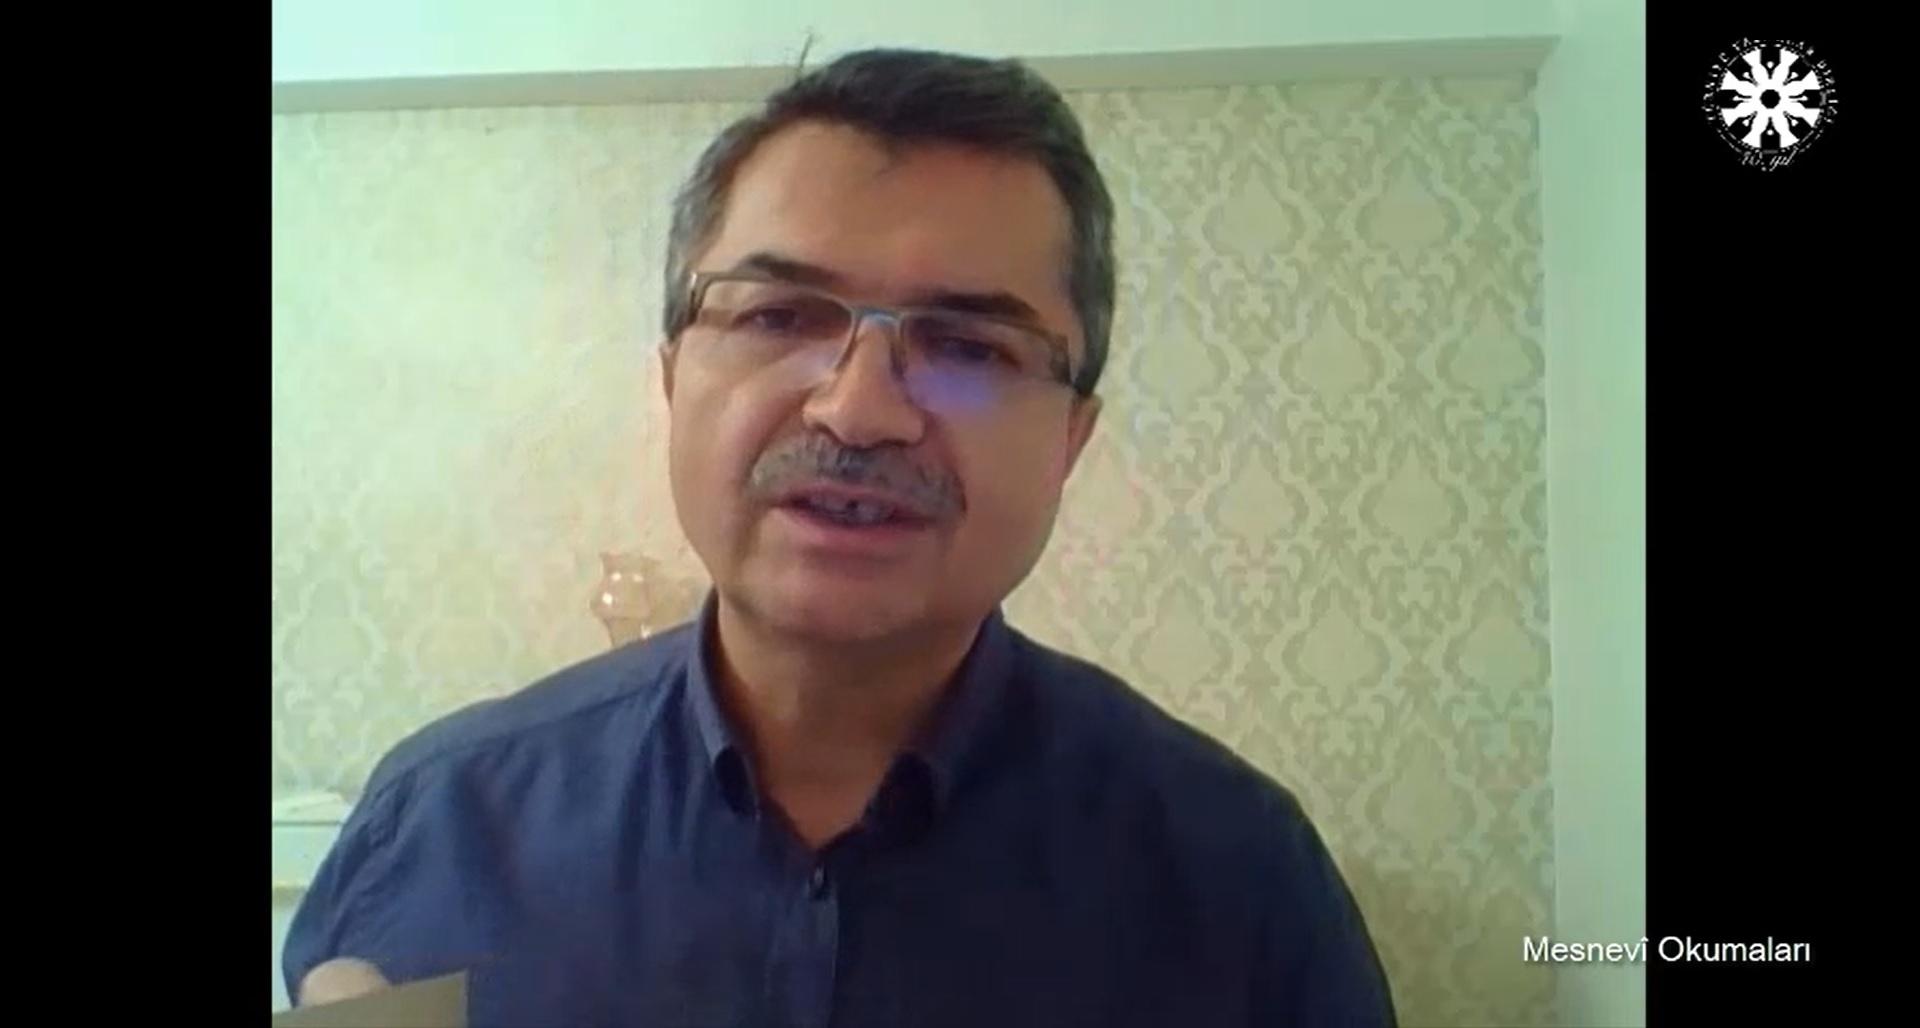 Mesnevî Okumaları -83- Dr. Fahrettin Coşguner